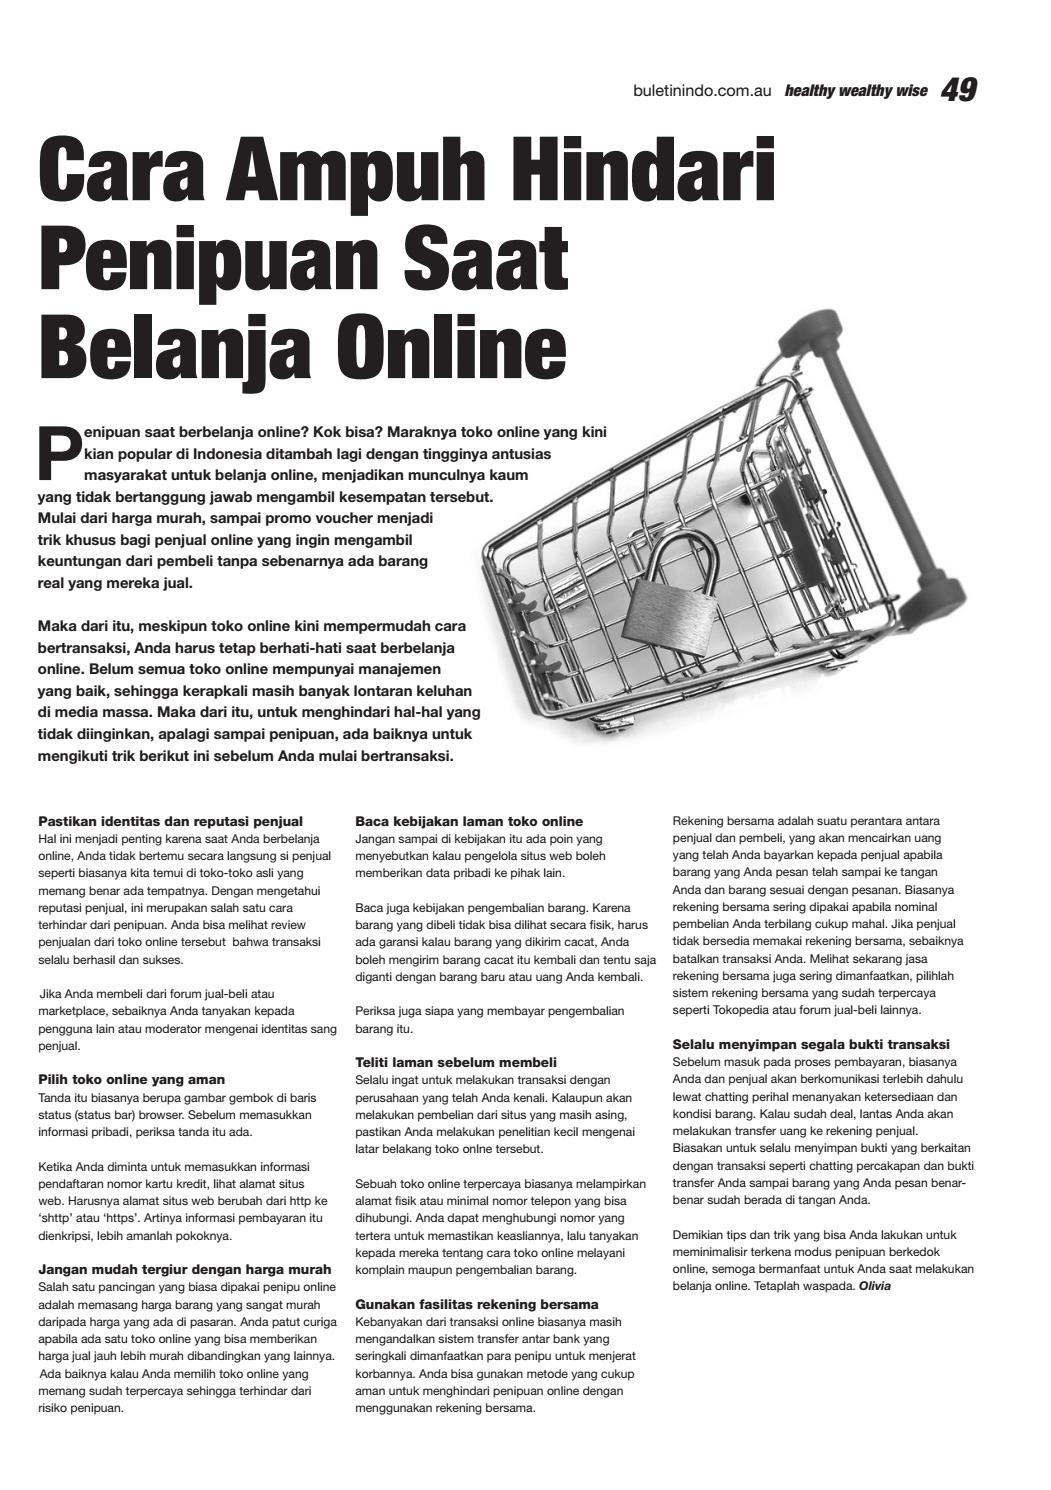 Buletin Indo January 2018 By Buletin Indo Issuu